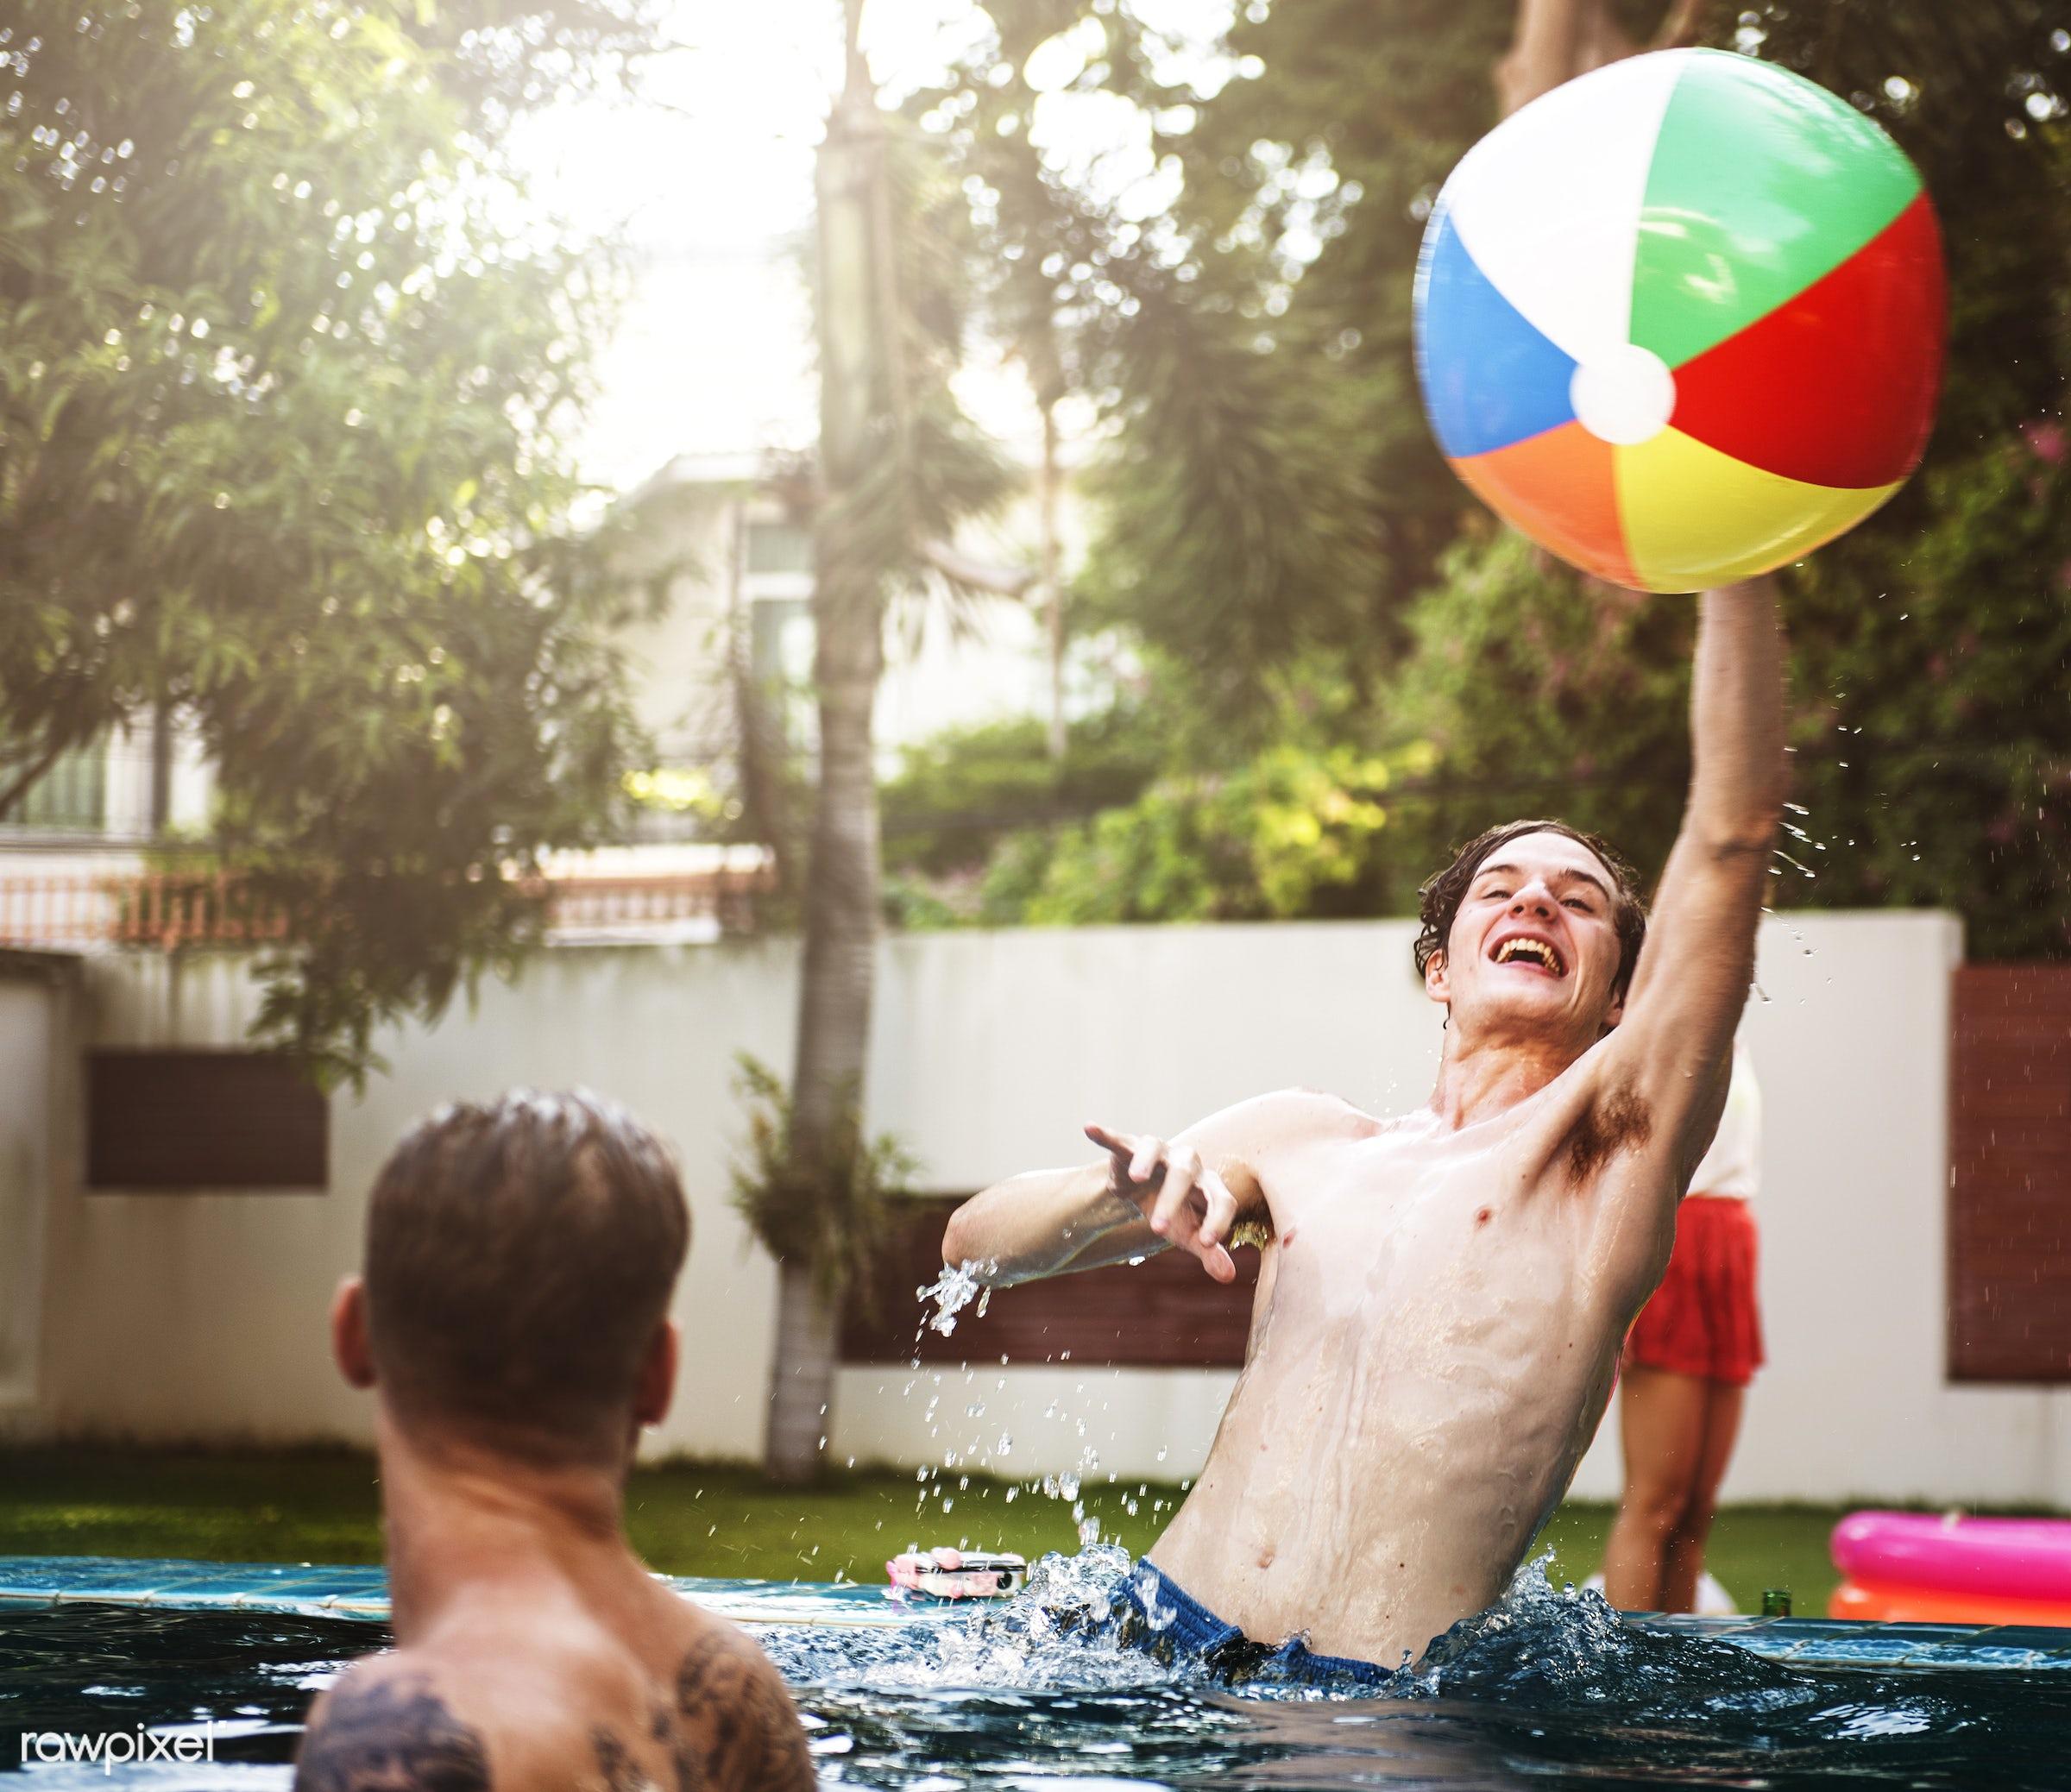 beach ball, cheerful, diverse, enjoying, friends, fun, group, happiness, inflatable, inflatable ball, joyful, leisure,...